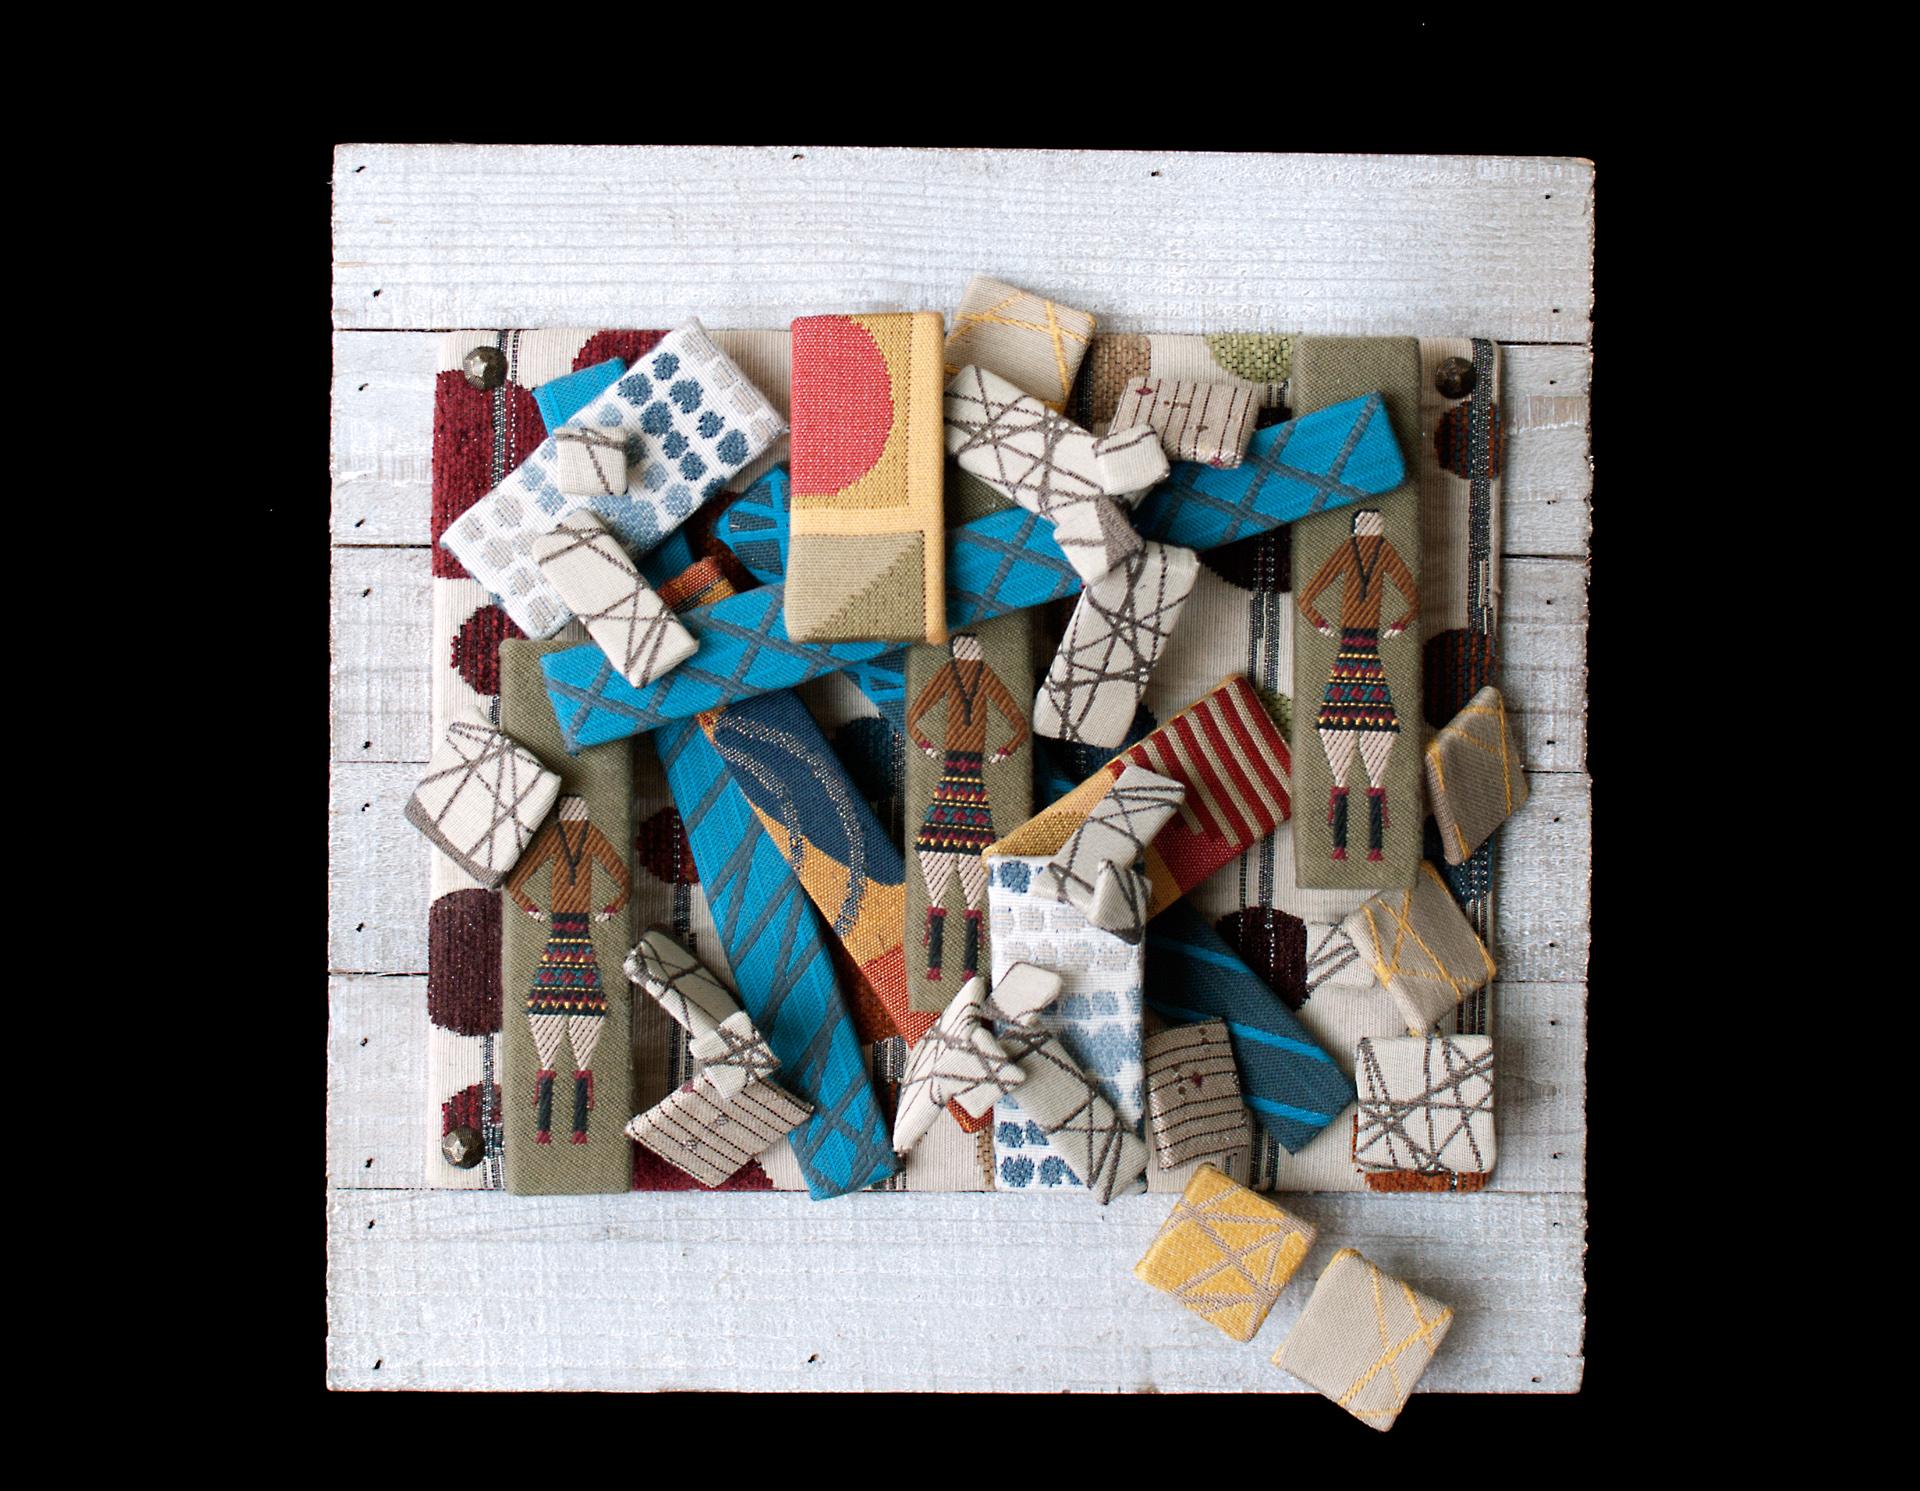 visual art, mixed media, textiles, fabric, 3D,  contemporary, abstract